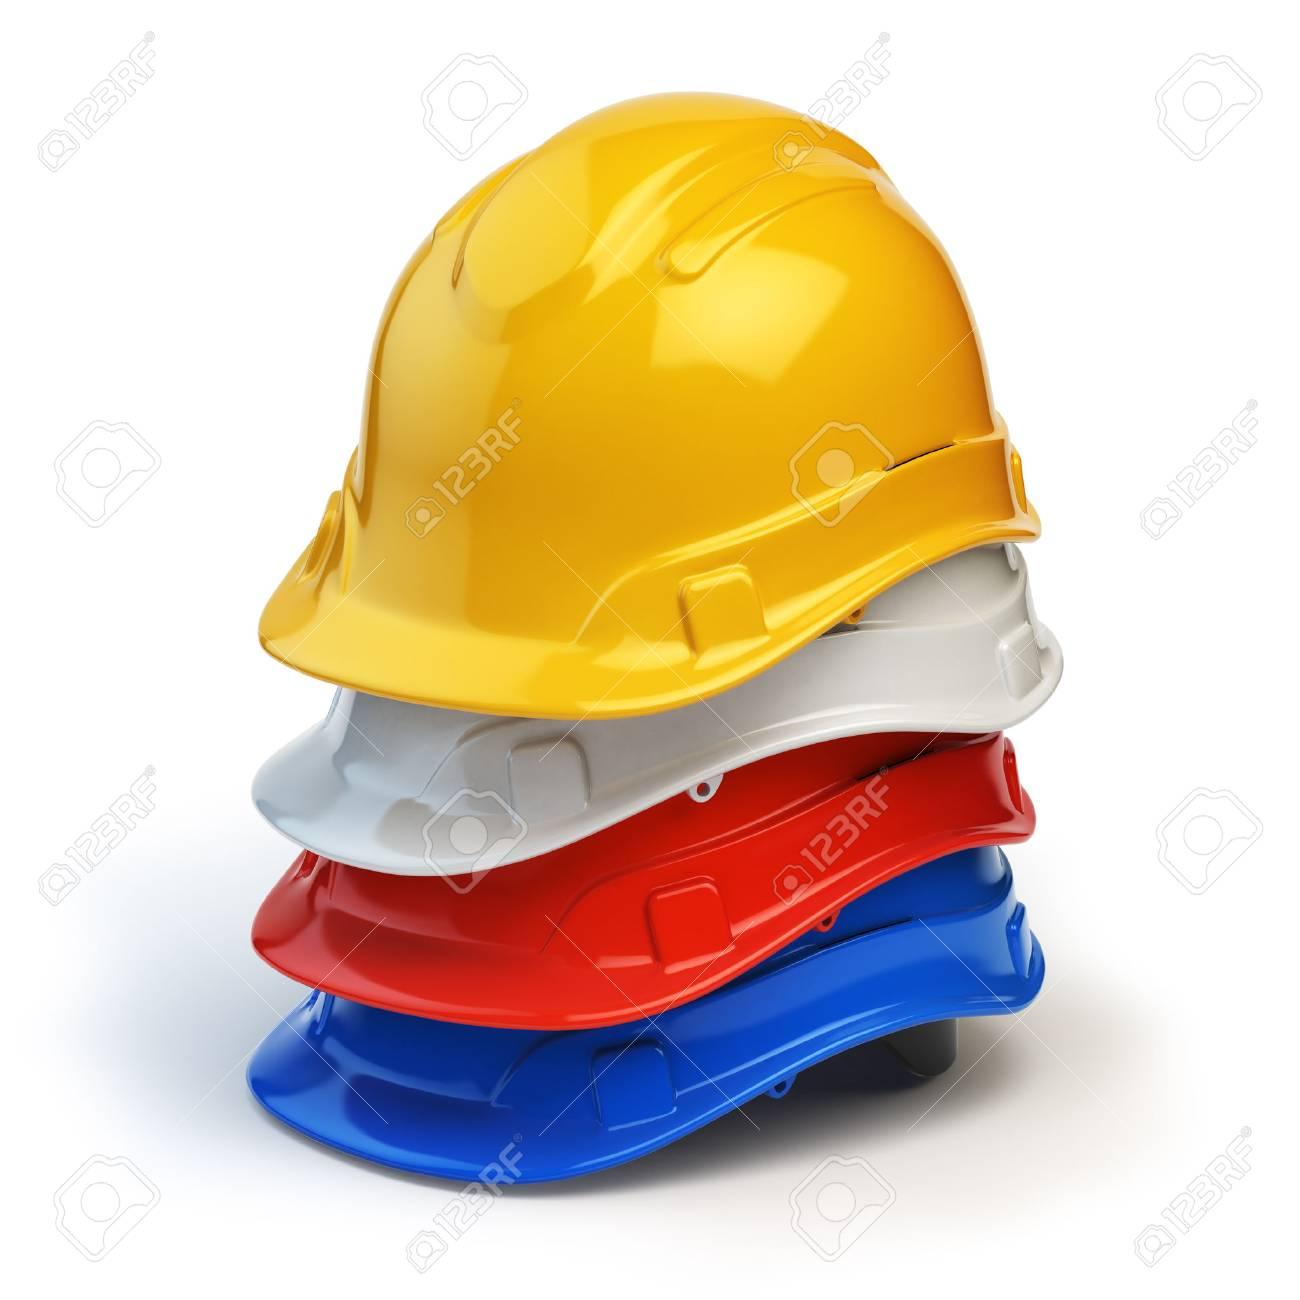 4b5712b05f8 Illustration - Various hard hats